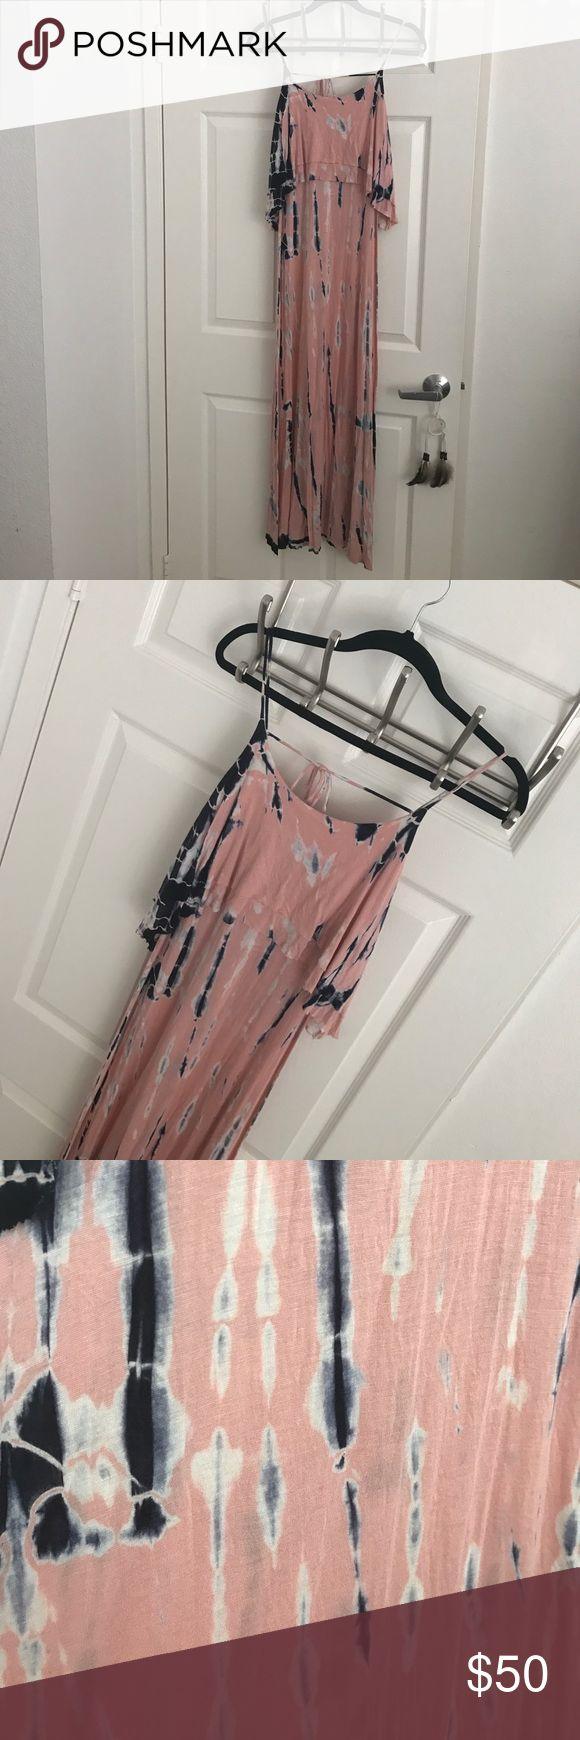 PINK TIE DYE MAXI DRESS SIZE SMALL PINK TIE DYE MAXI DRESS SIZE SMALL freeloader Dresses Maxi